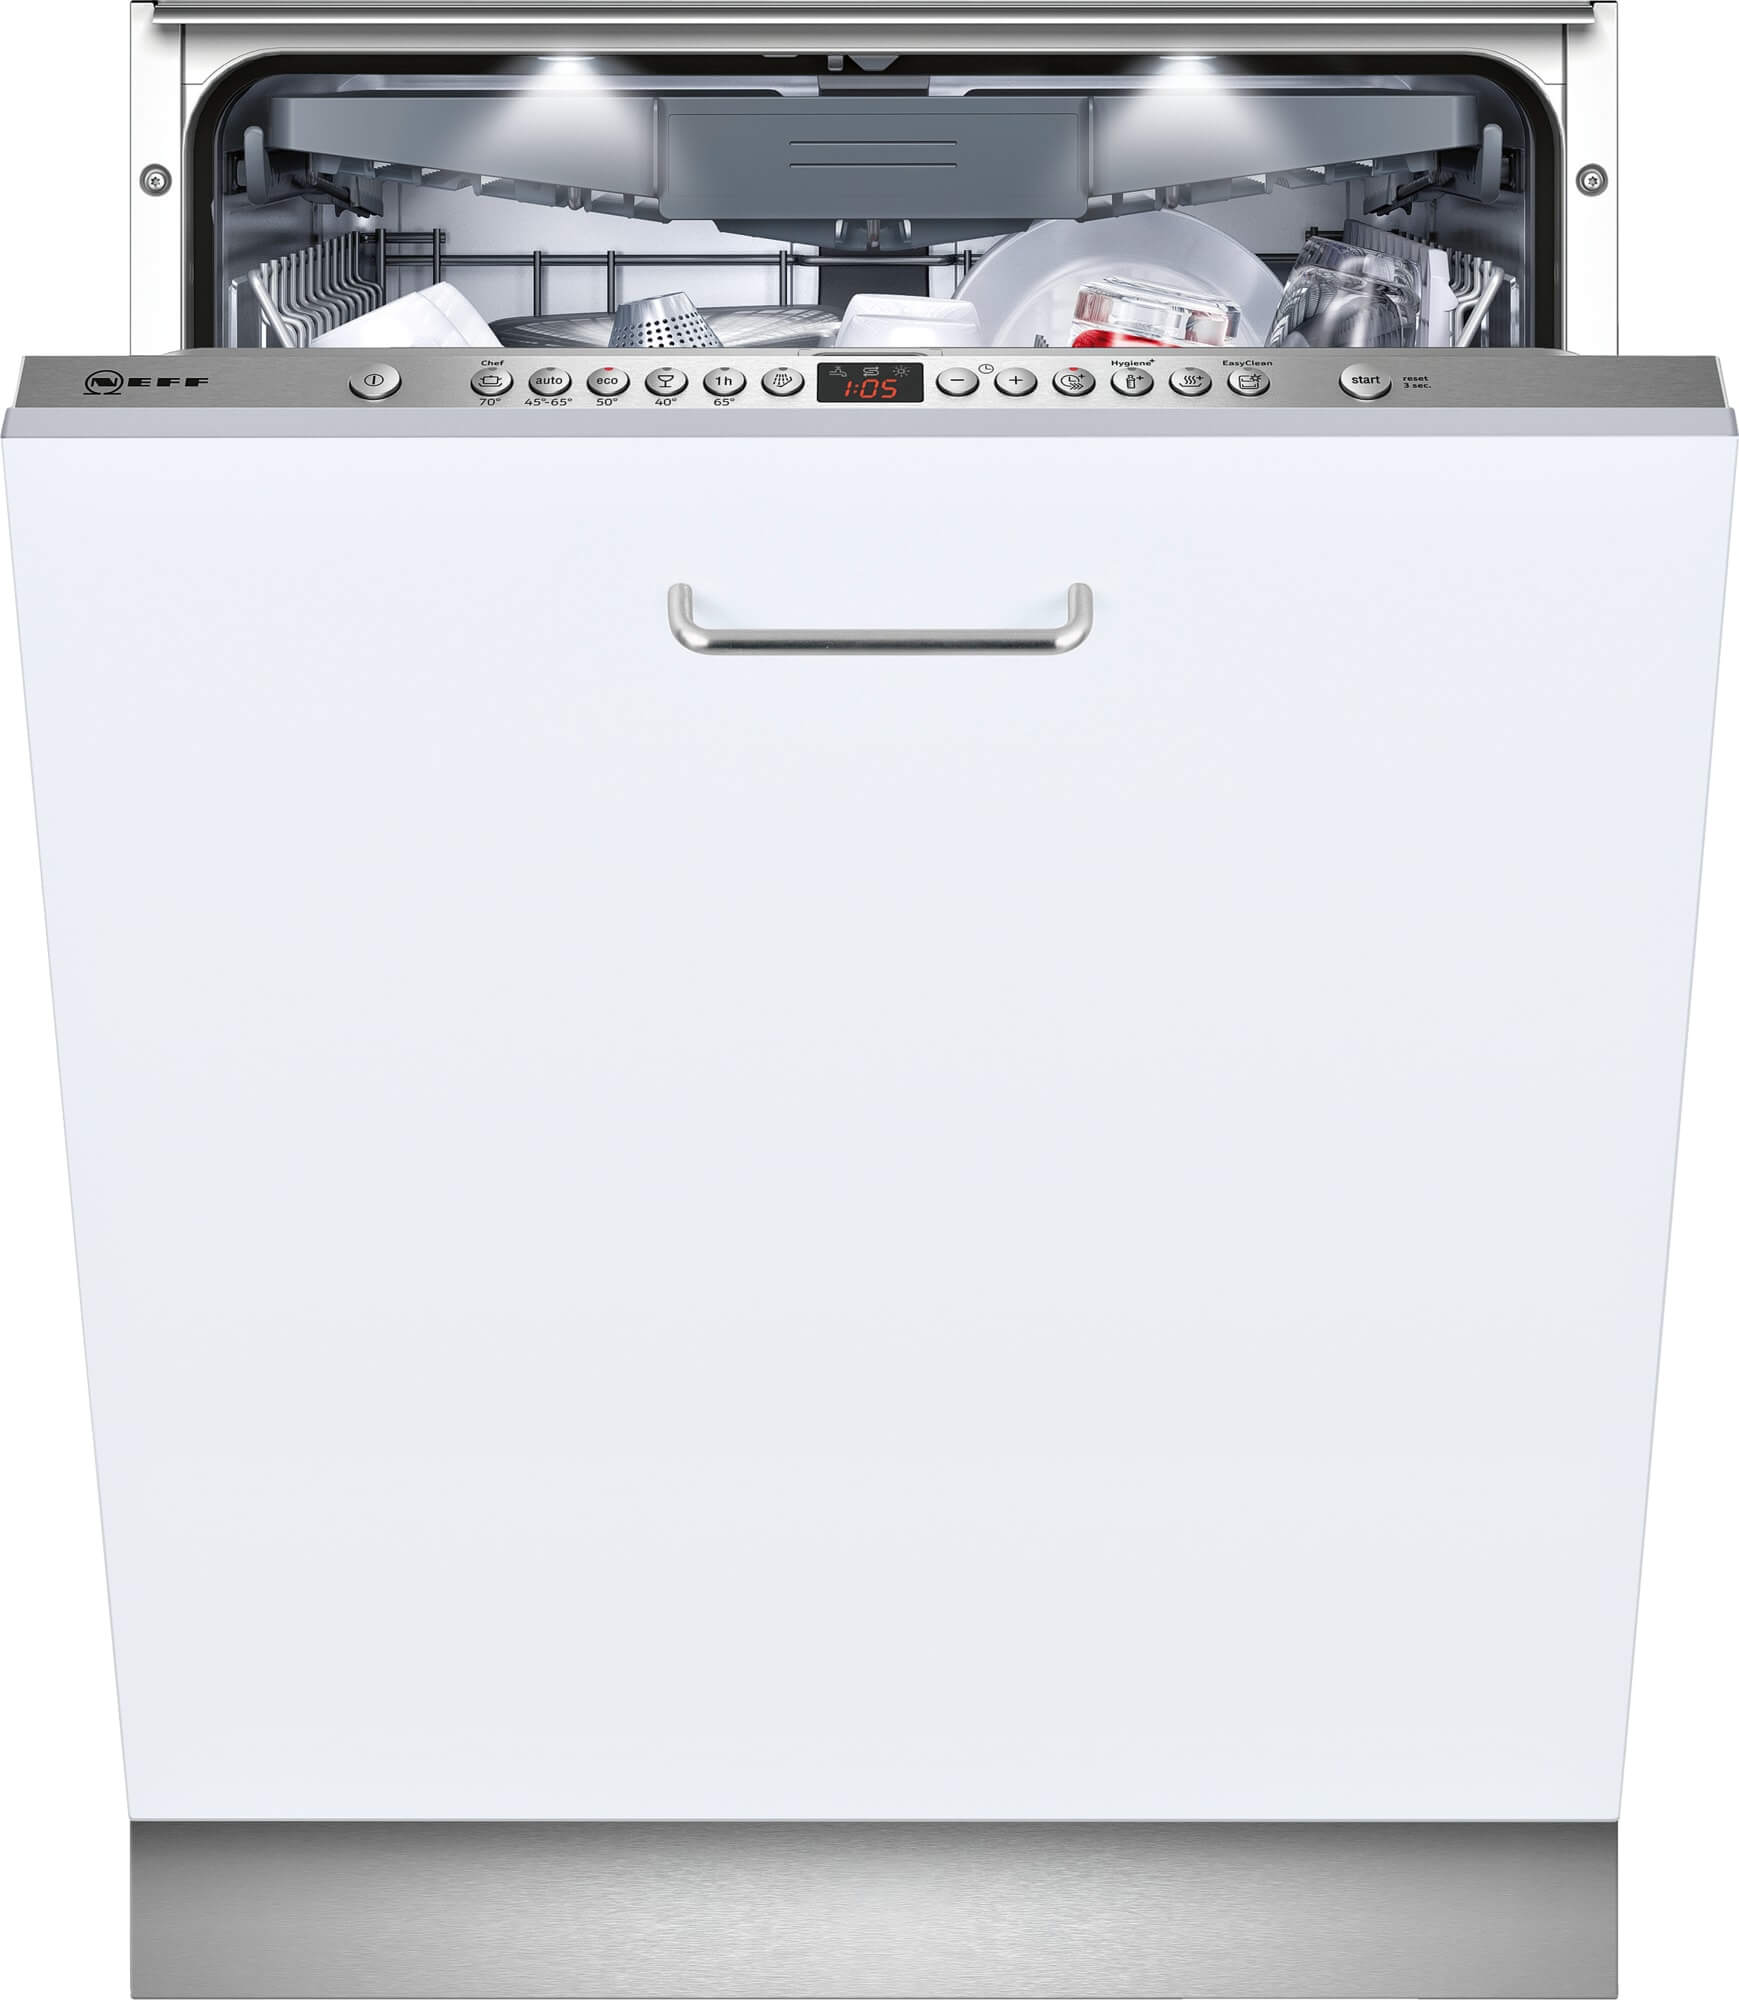 neff s416t80s0g integrated dishwasher appliance world. Black Bedroom Furniture Sets. Home Design Ideas